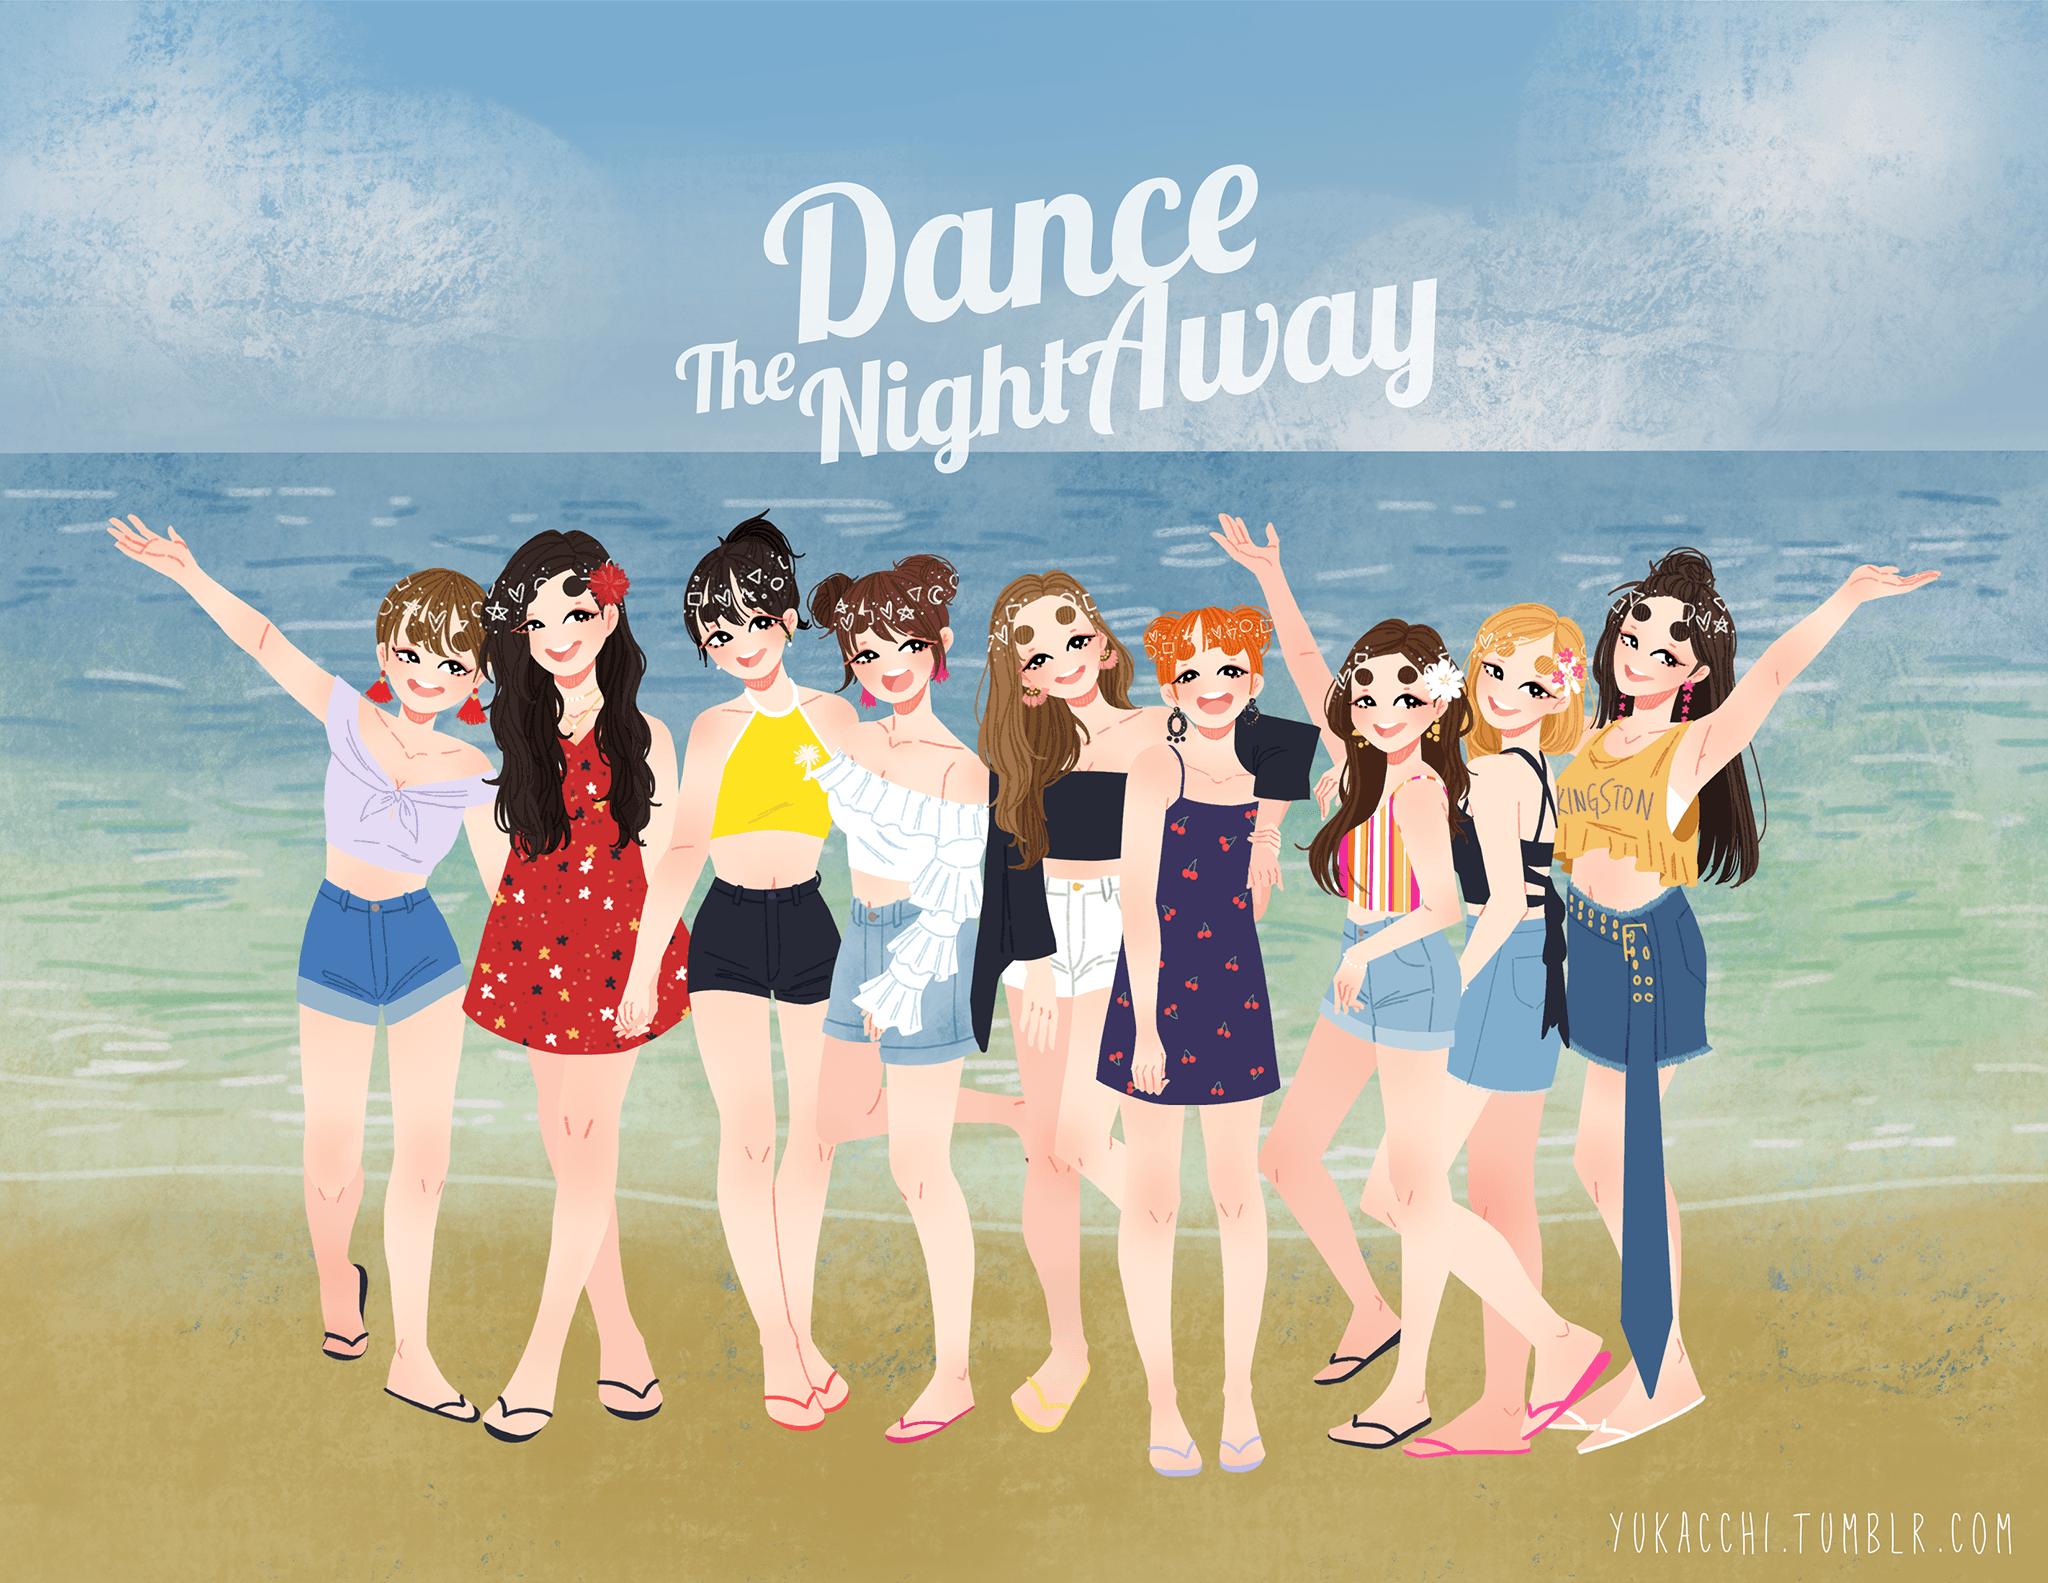 Night away the dance